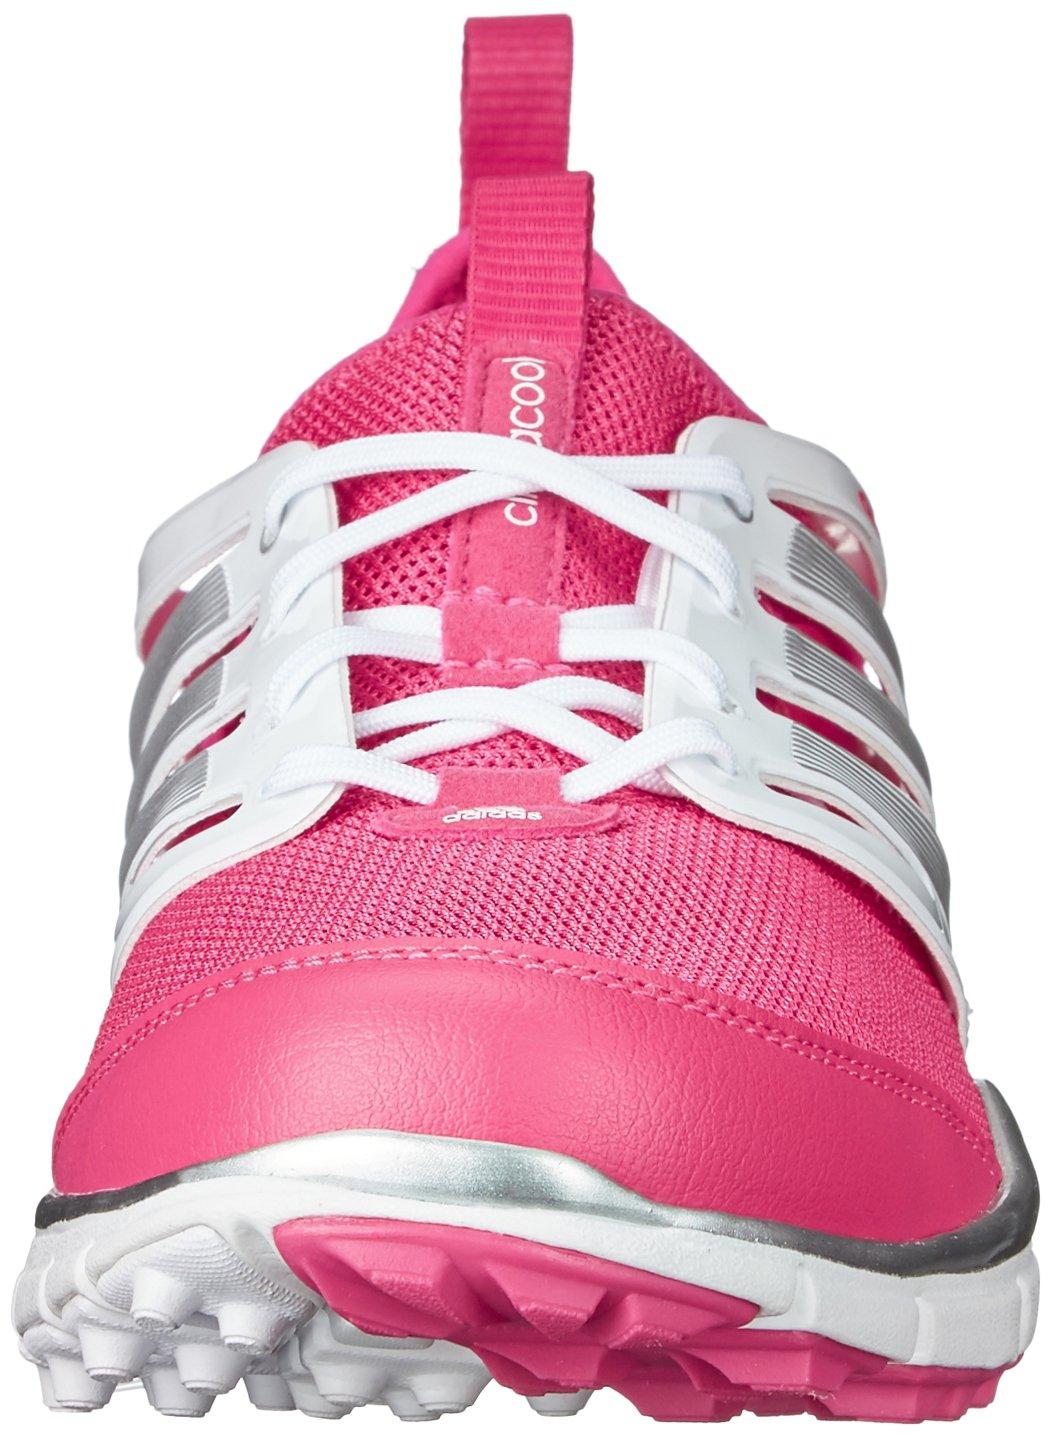 adidas Women's W Climacool 8 II Golf Shoe B013UTMLYA 8 Climacool B(M) US|Raspberry Rose-tmag/Ftwr White/Silver Metallic 17b4c4